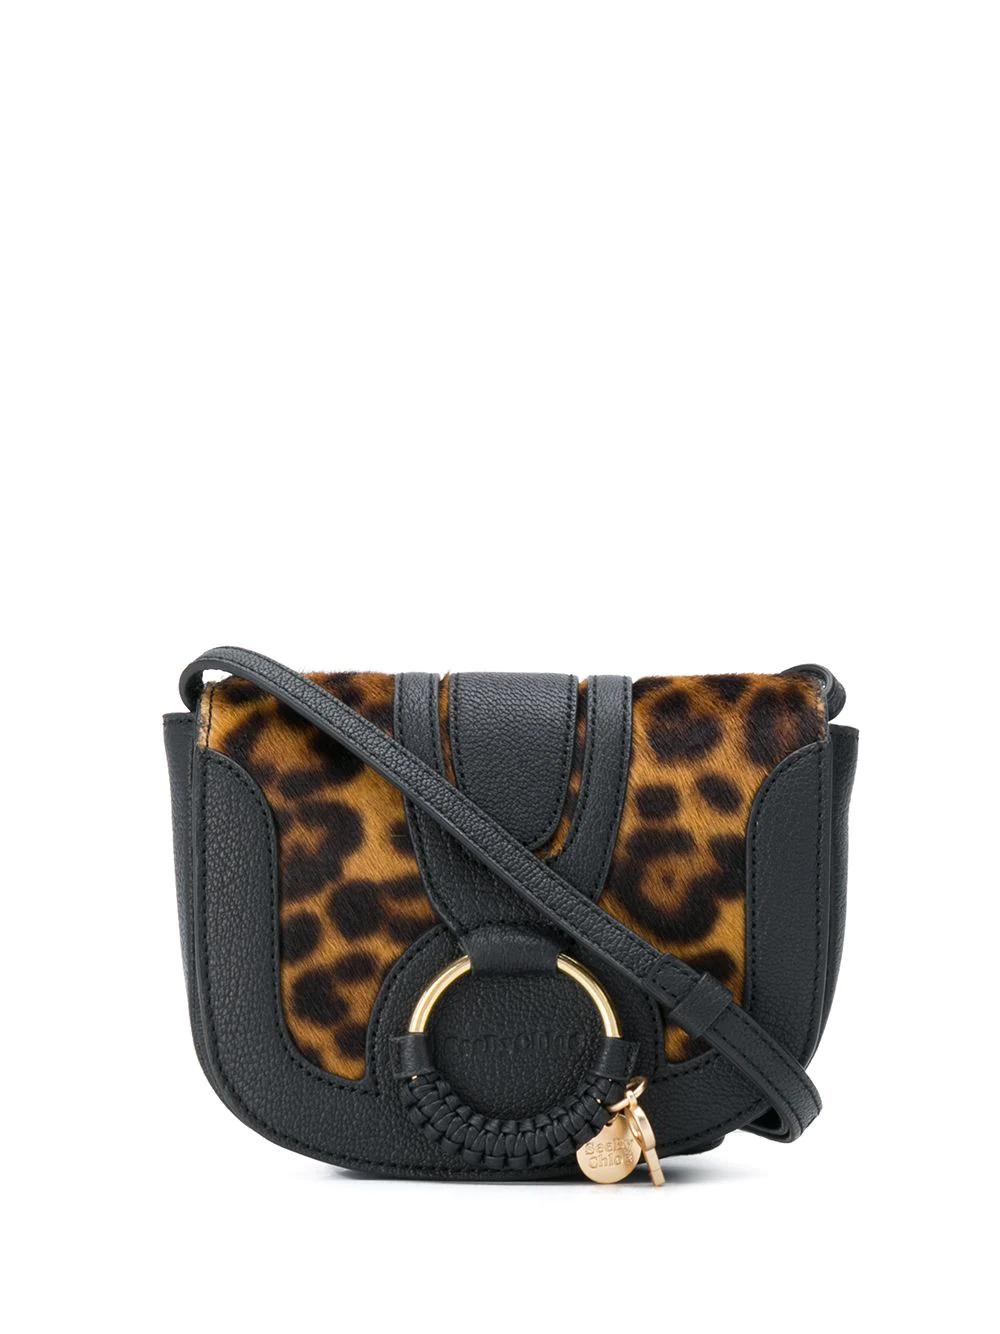 See by Chloé | сумка через плечо Hana | Clouty